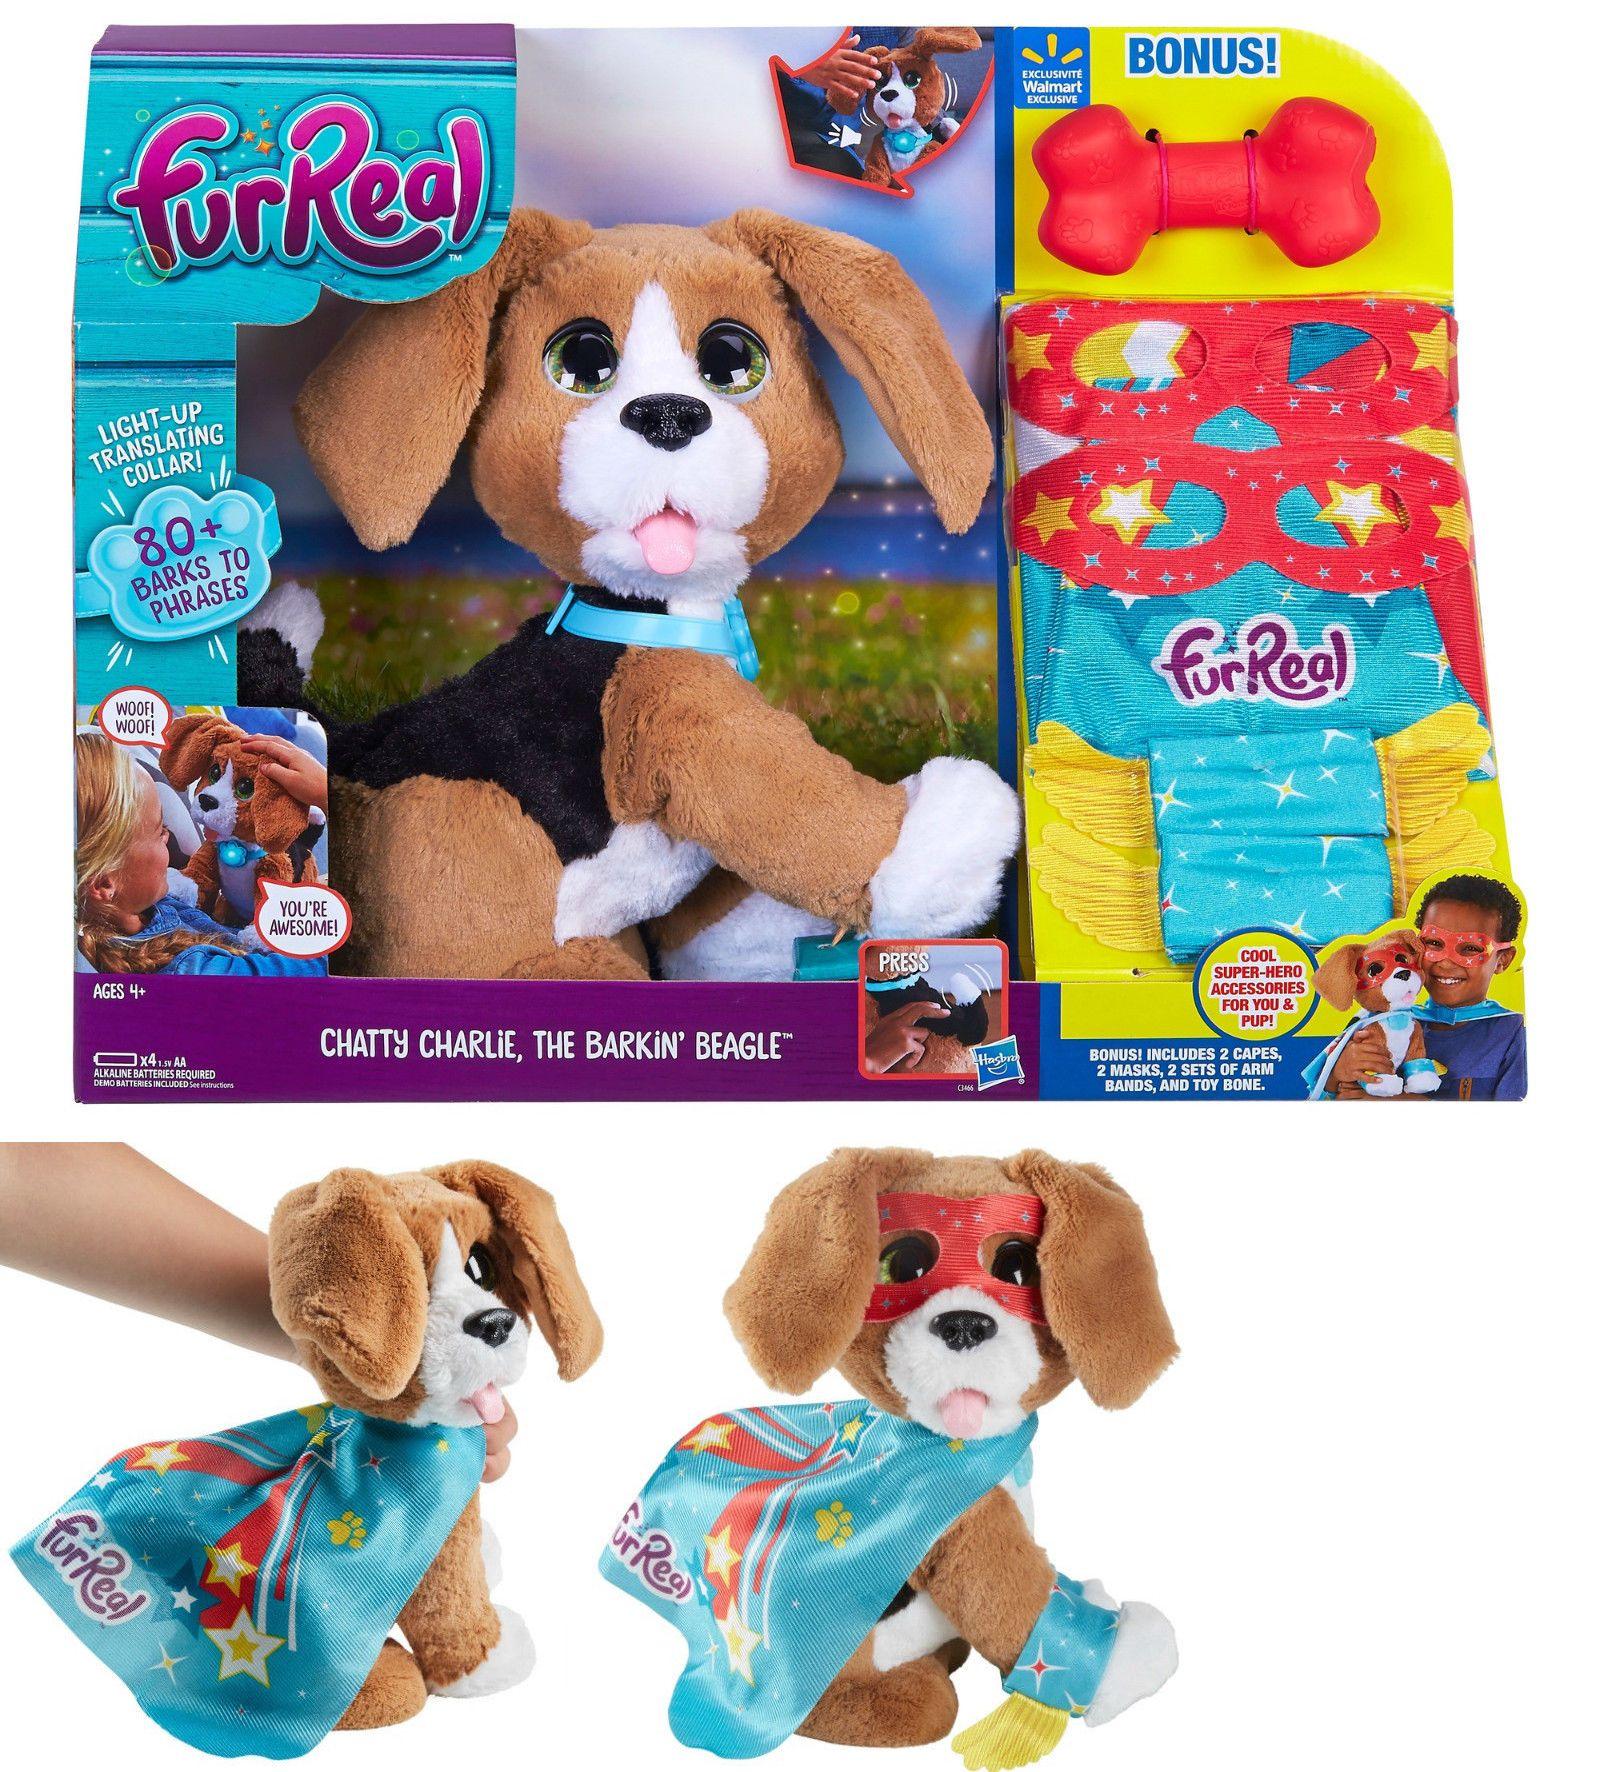 Furreal Friends 38288 Furreal Chatty Charlie Barkin Beagle Super